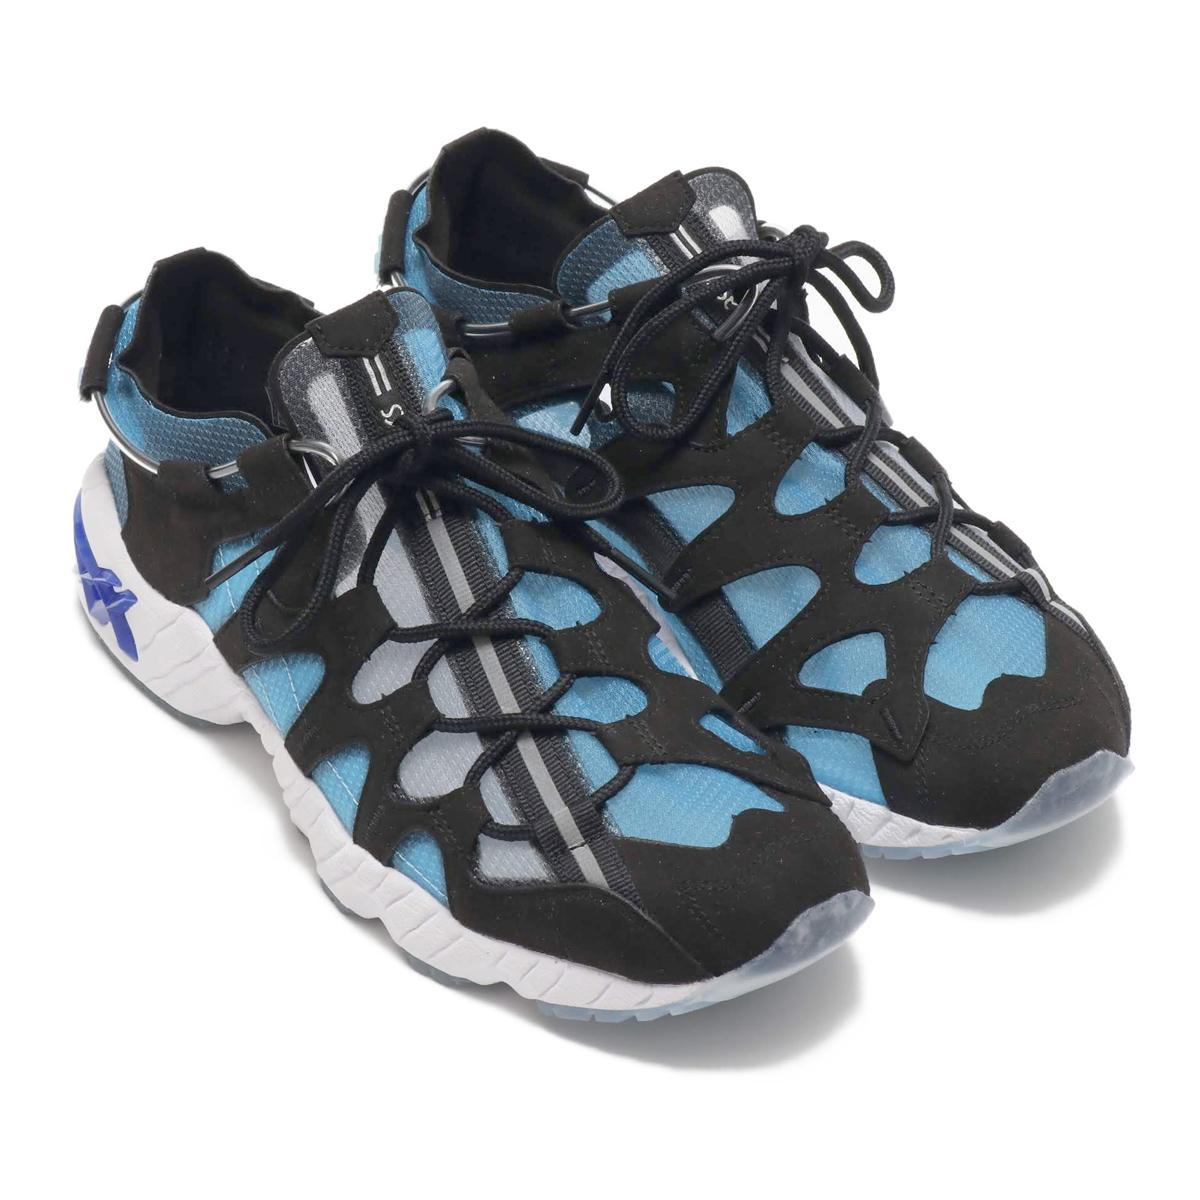 f:id:sneakerscaffetokyo:20190704091522j:plain